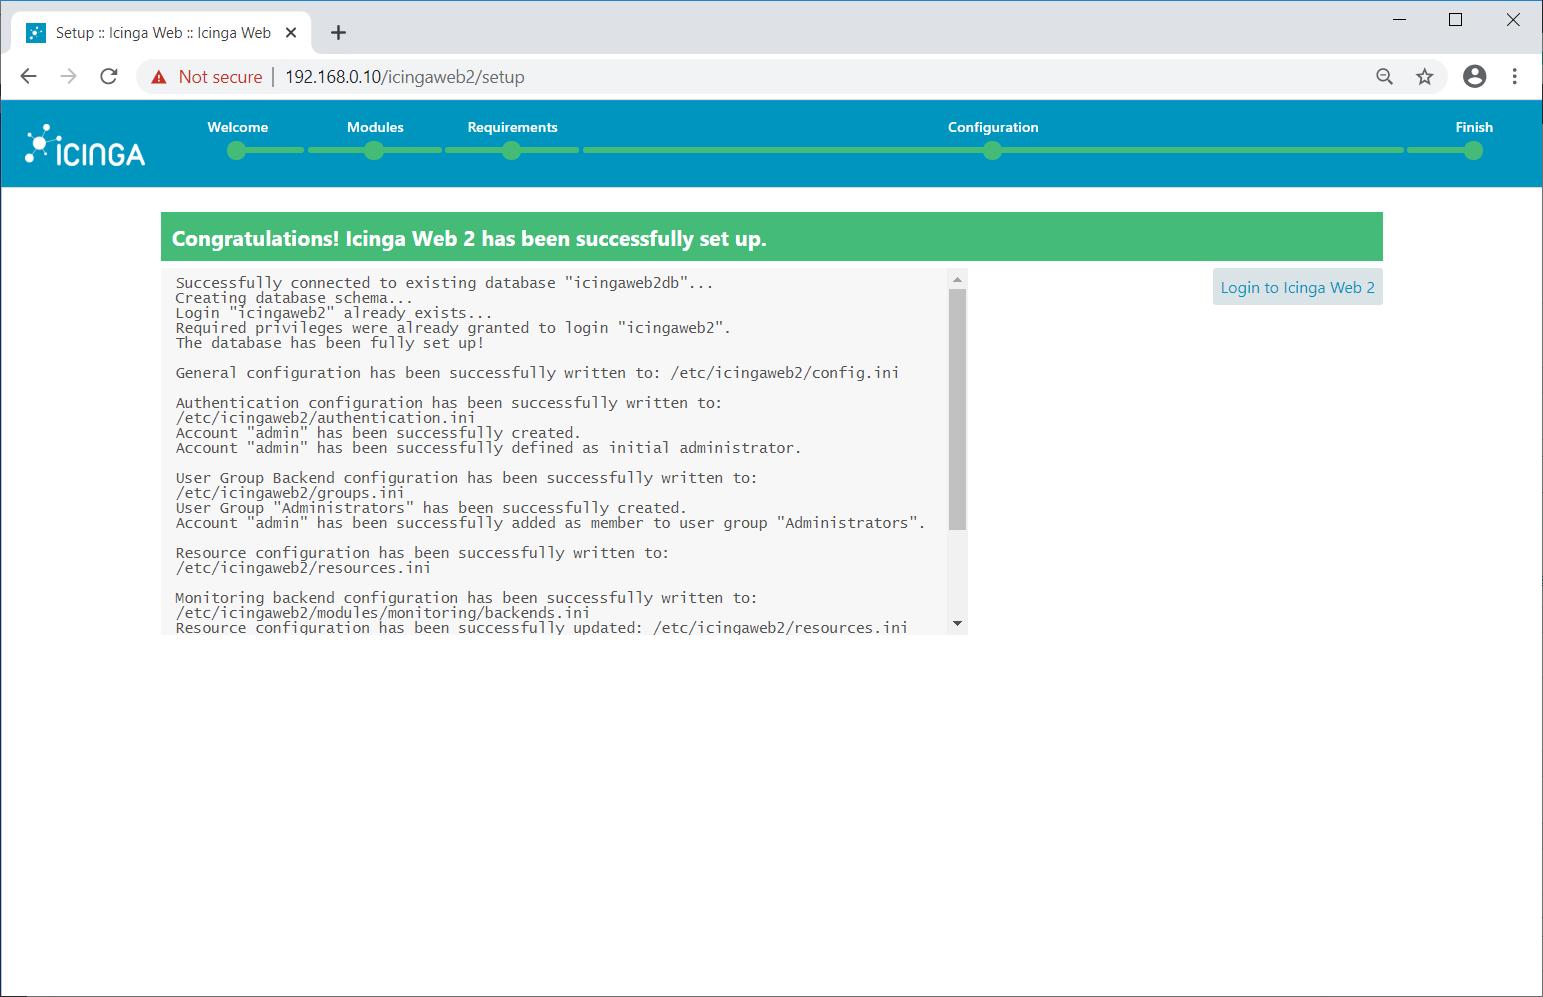 Icinga Web 2 Installation Complete